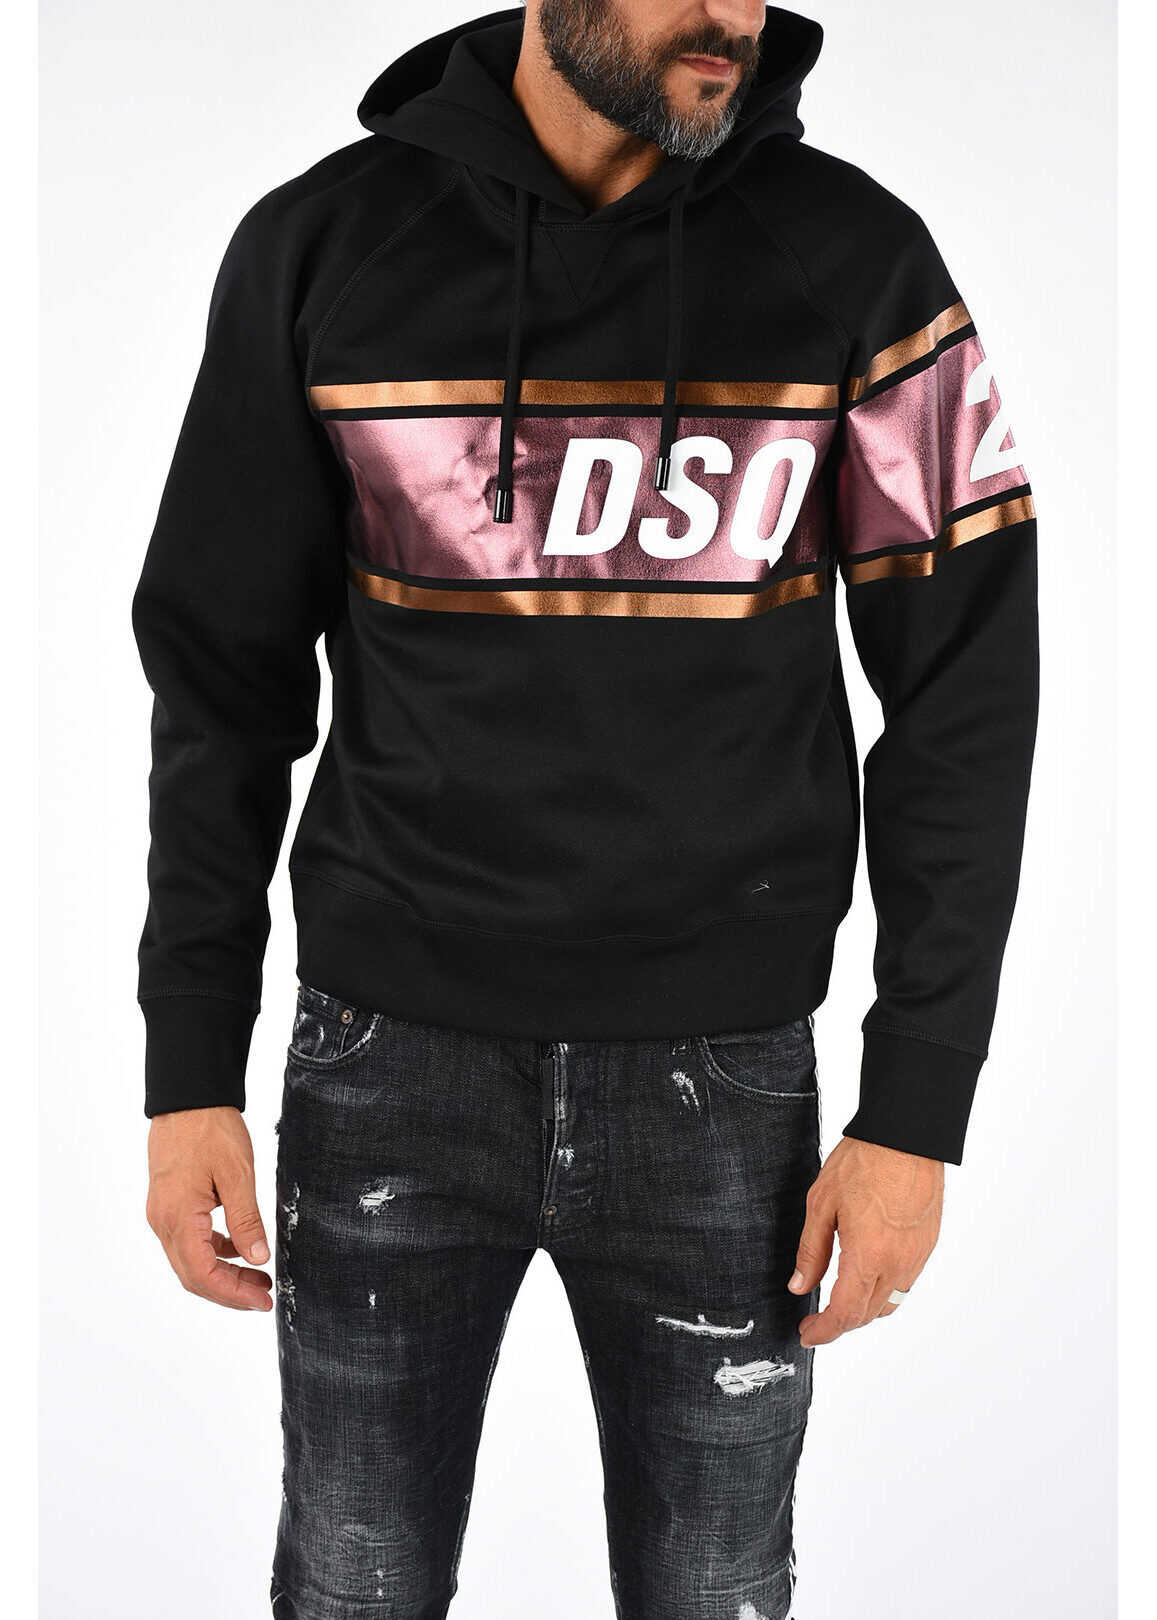 DSQUARED2 Printed Hooded COOL FIT Sweatshirt BLACK